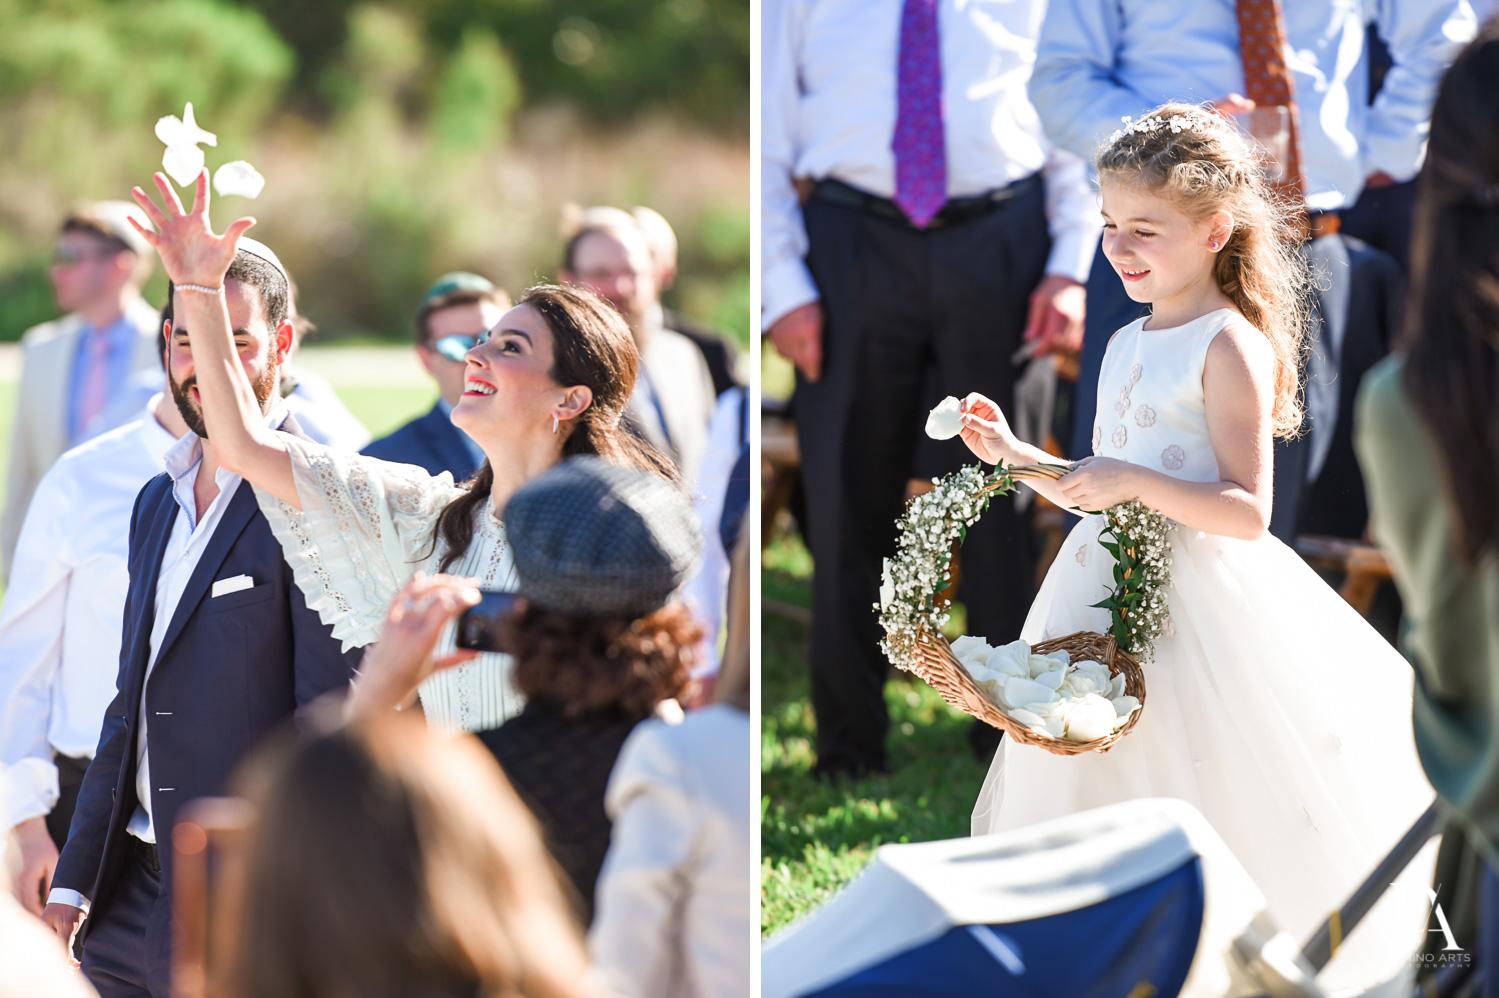 natural photos at Traditional Jewish Wedding at Deering Estate Miami by Domino Arts Photography